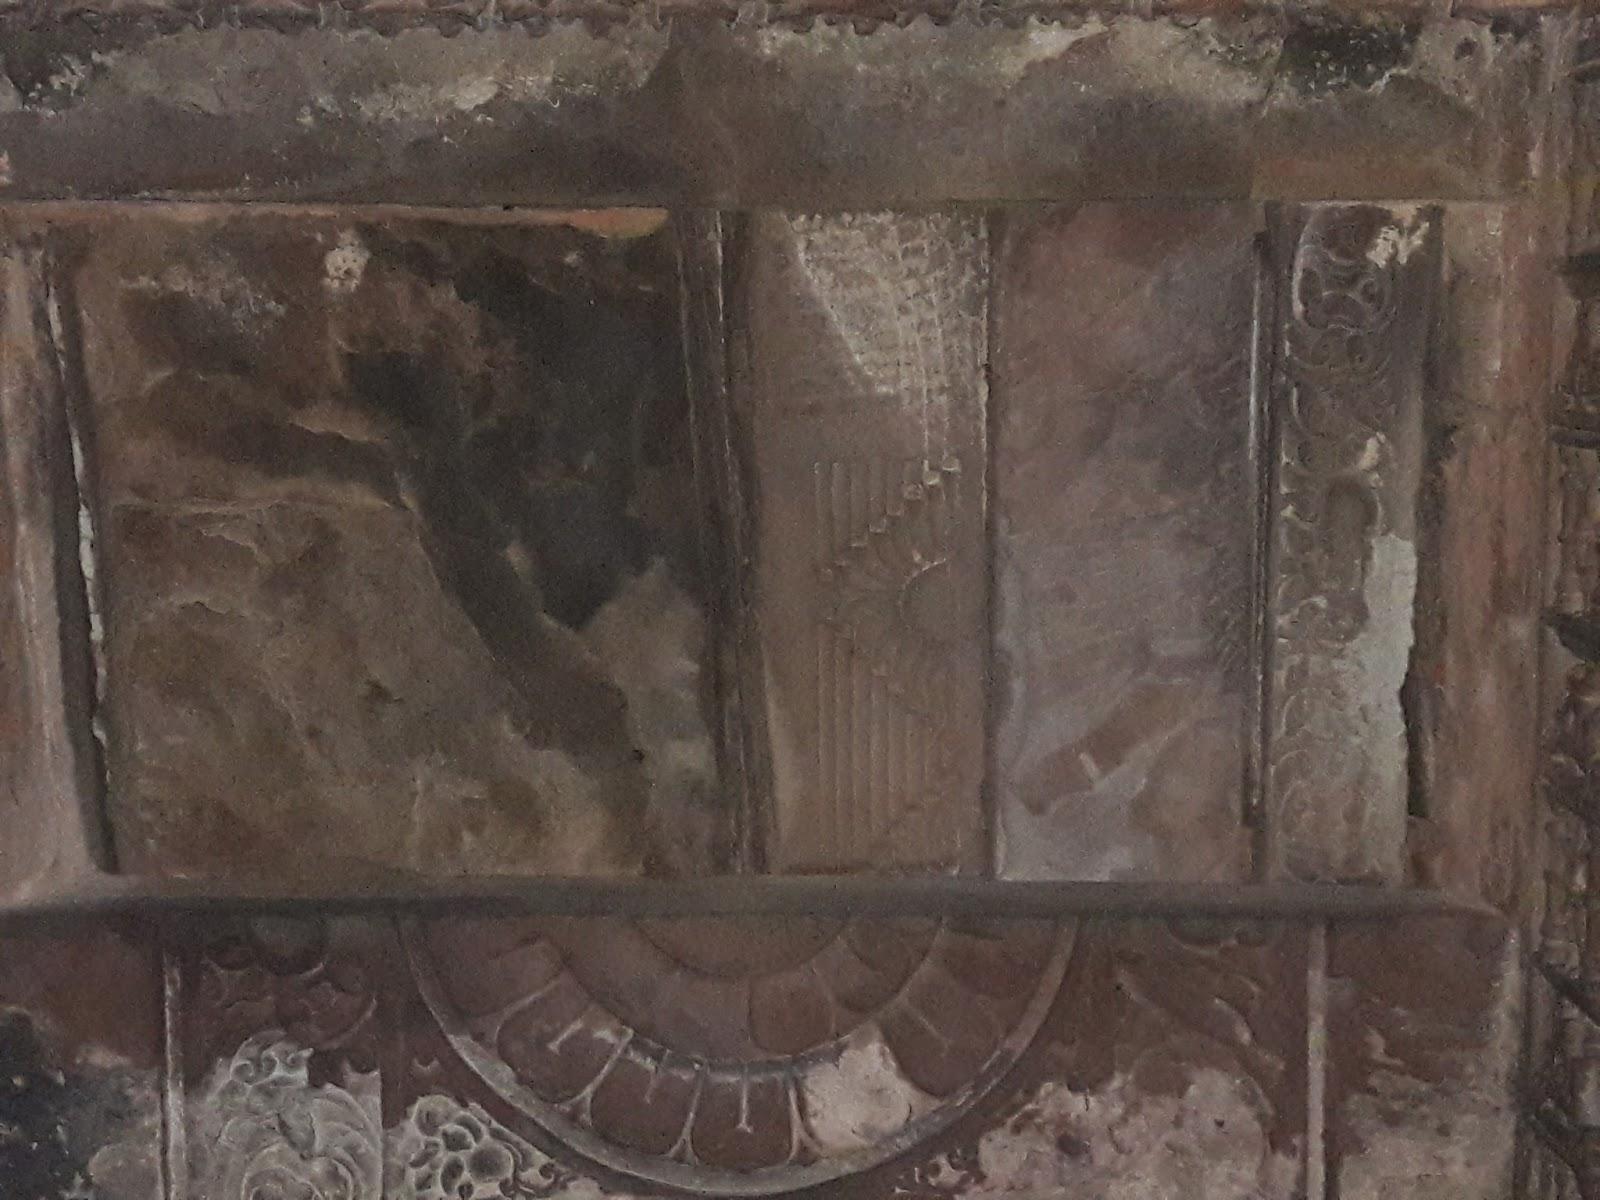 Kanpur jagannath temple bhubaneswar buzz3